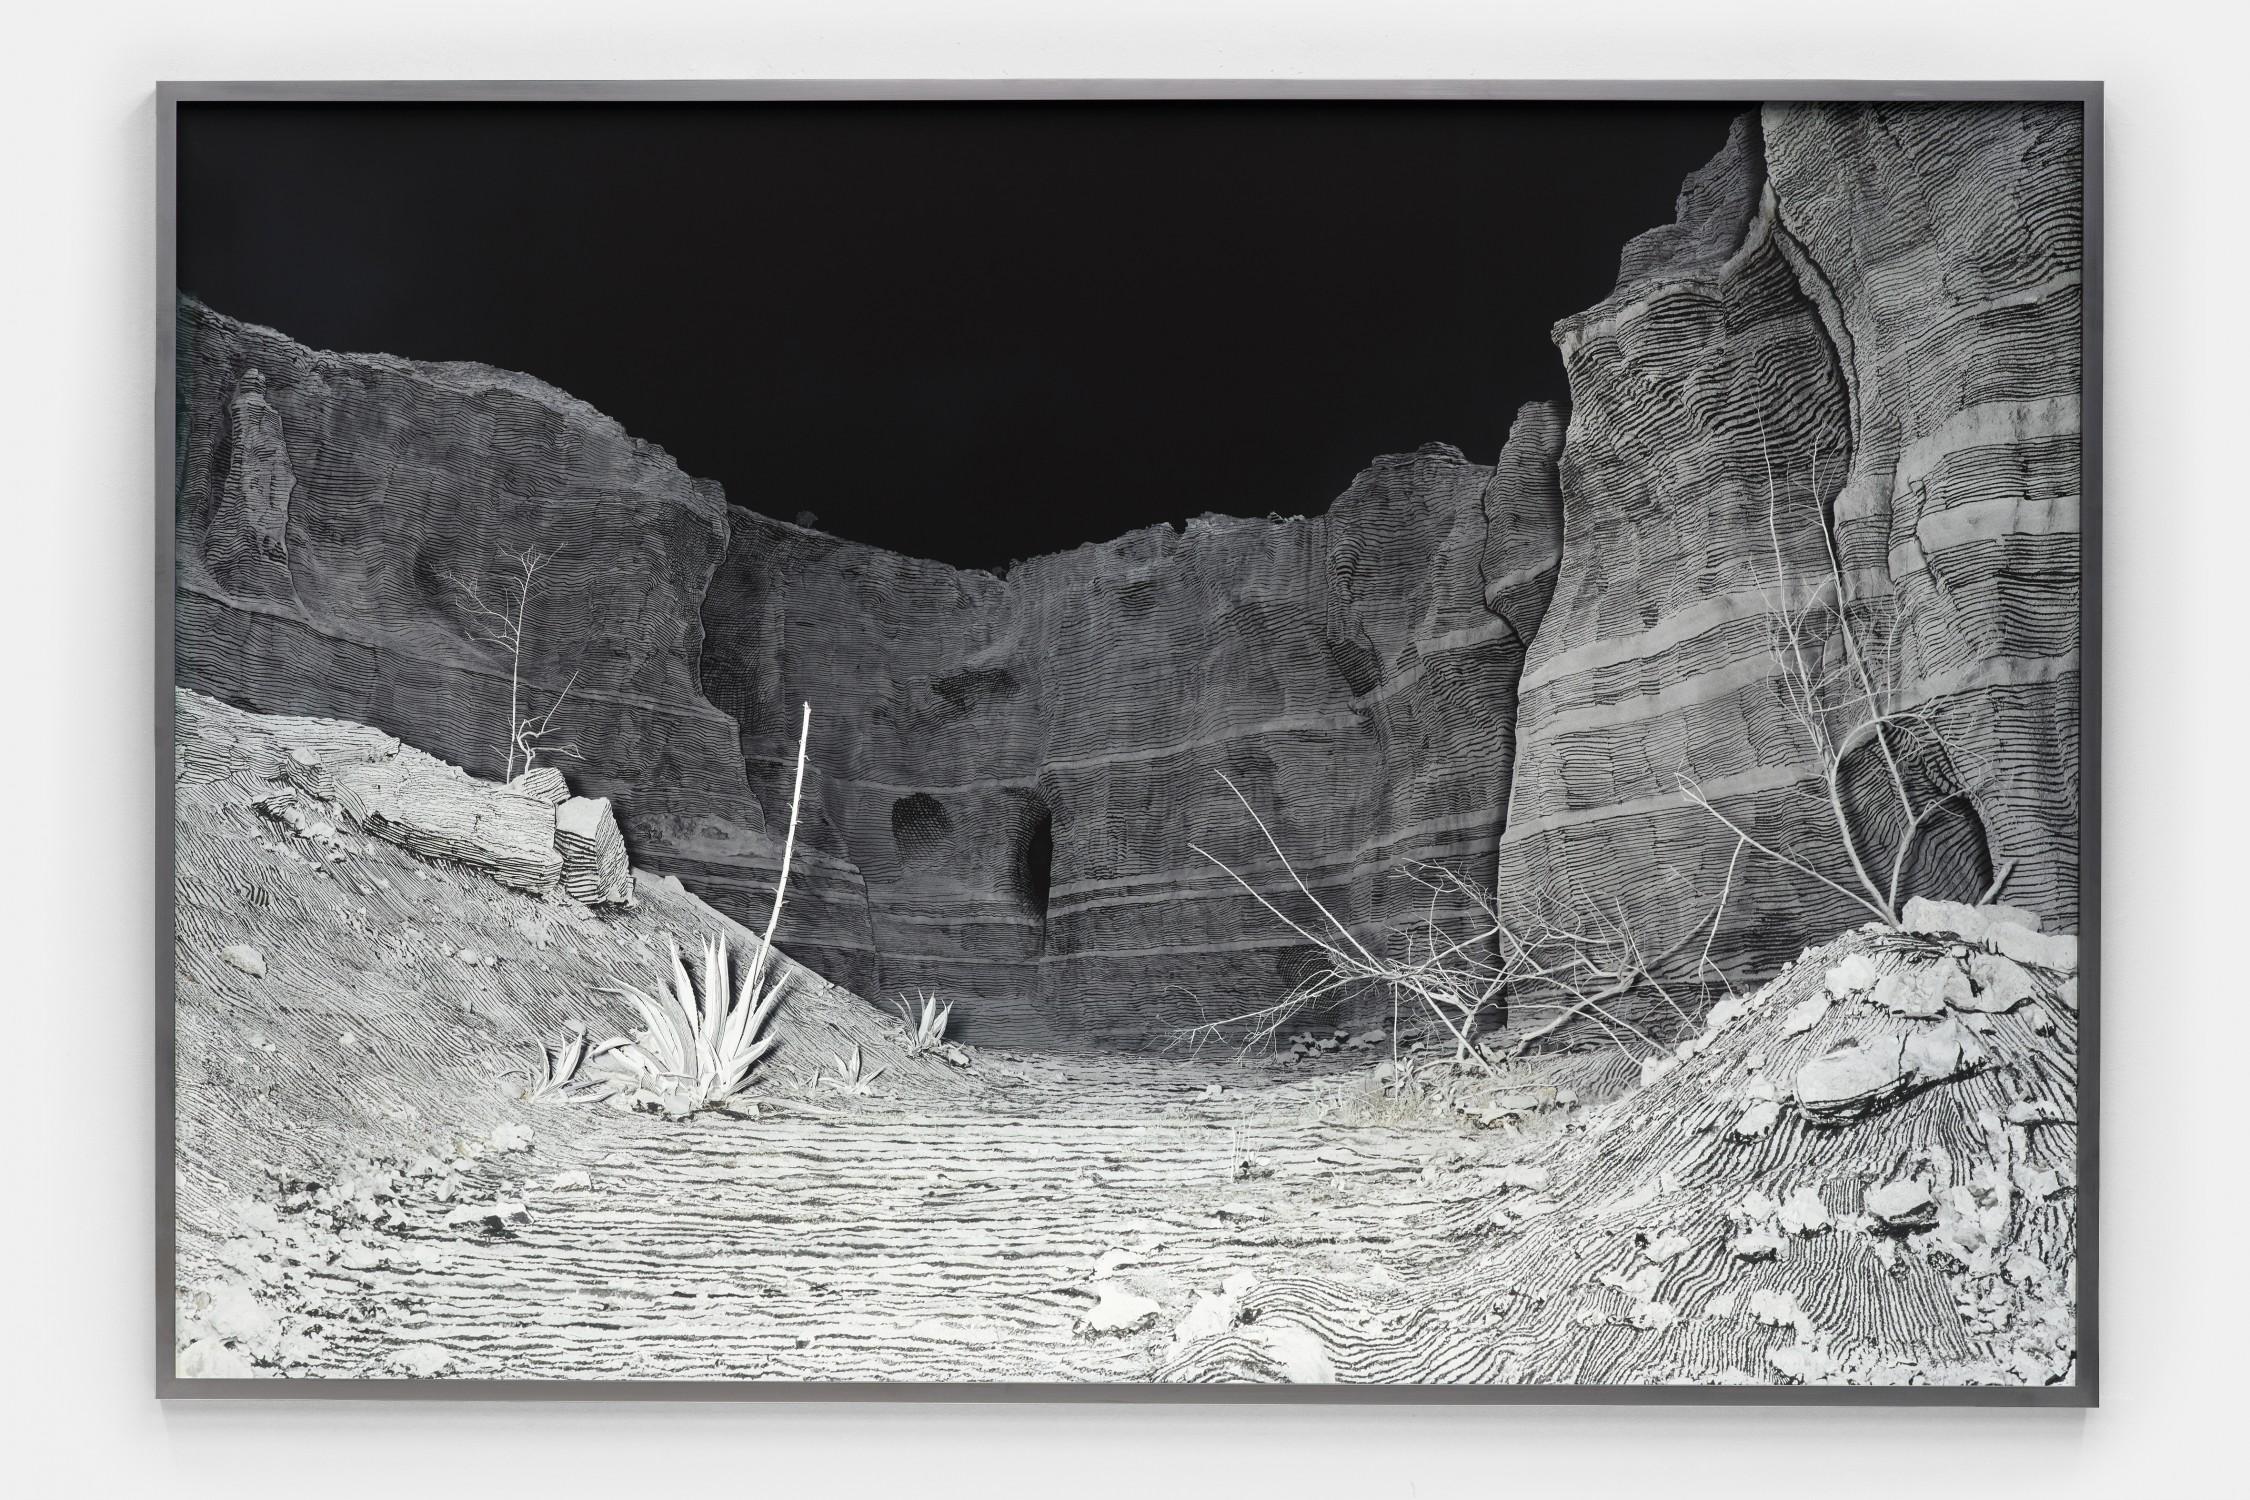 Landscape Painting Quarry (Night)